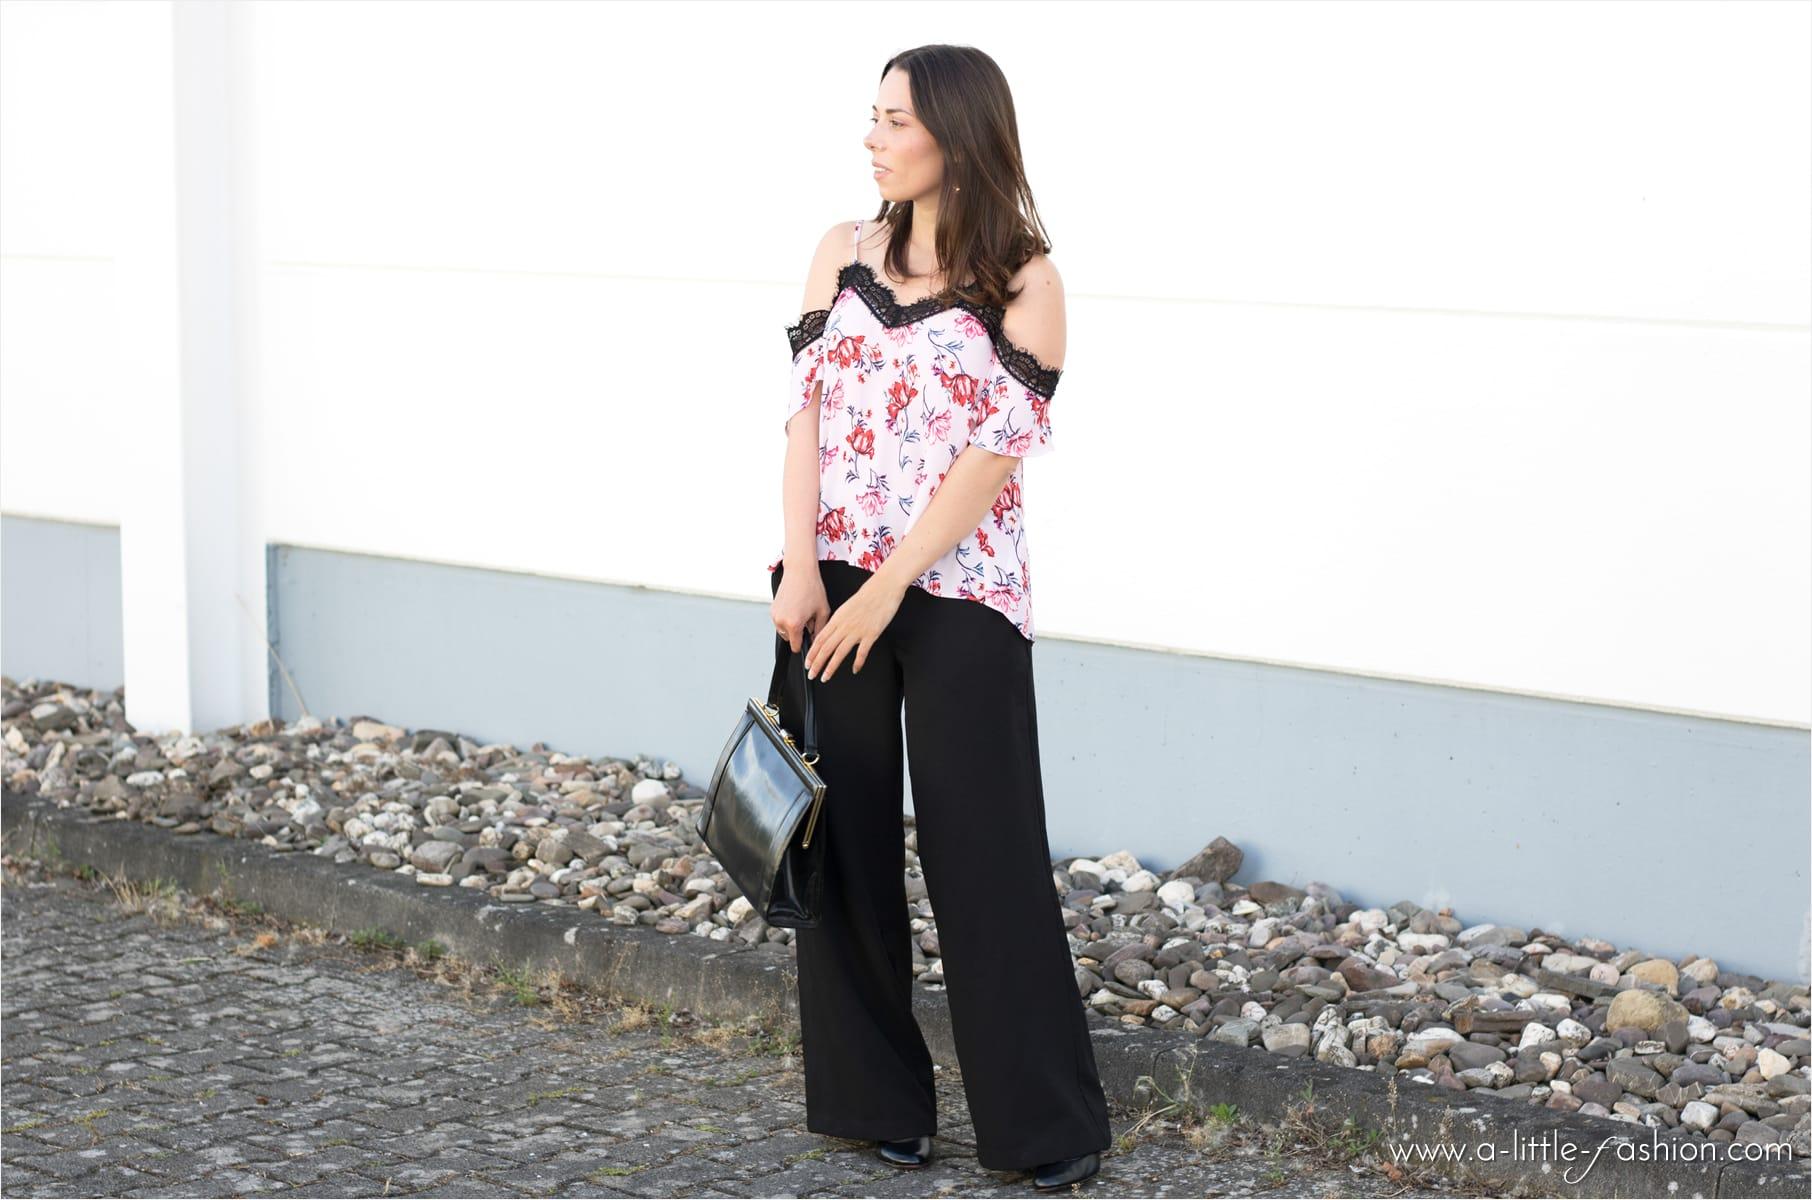 sommer-outfit_offshoulder-top_palazzo-hose_lingerie_spitze_blumen5-min